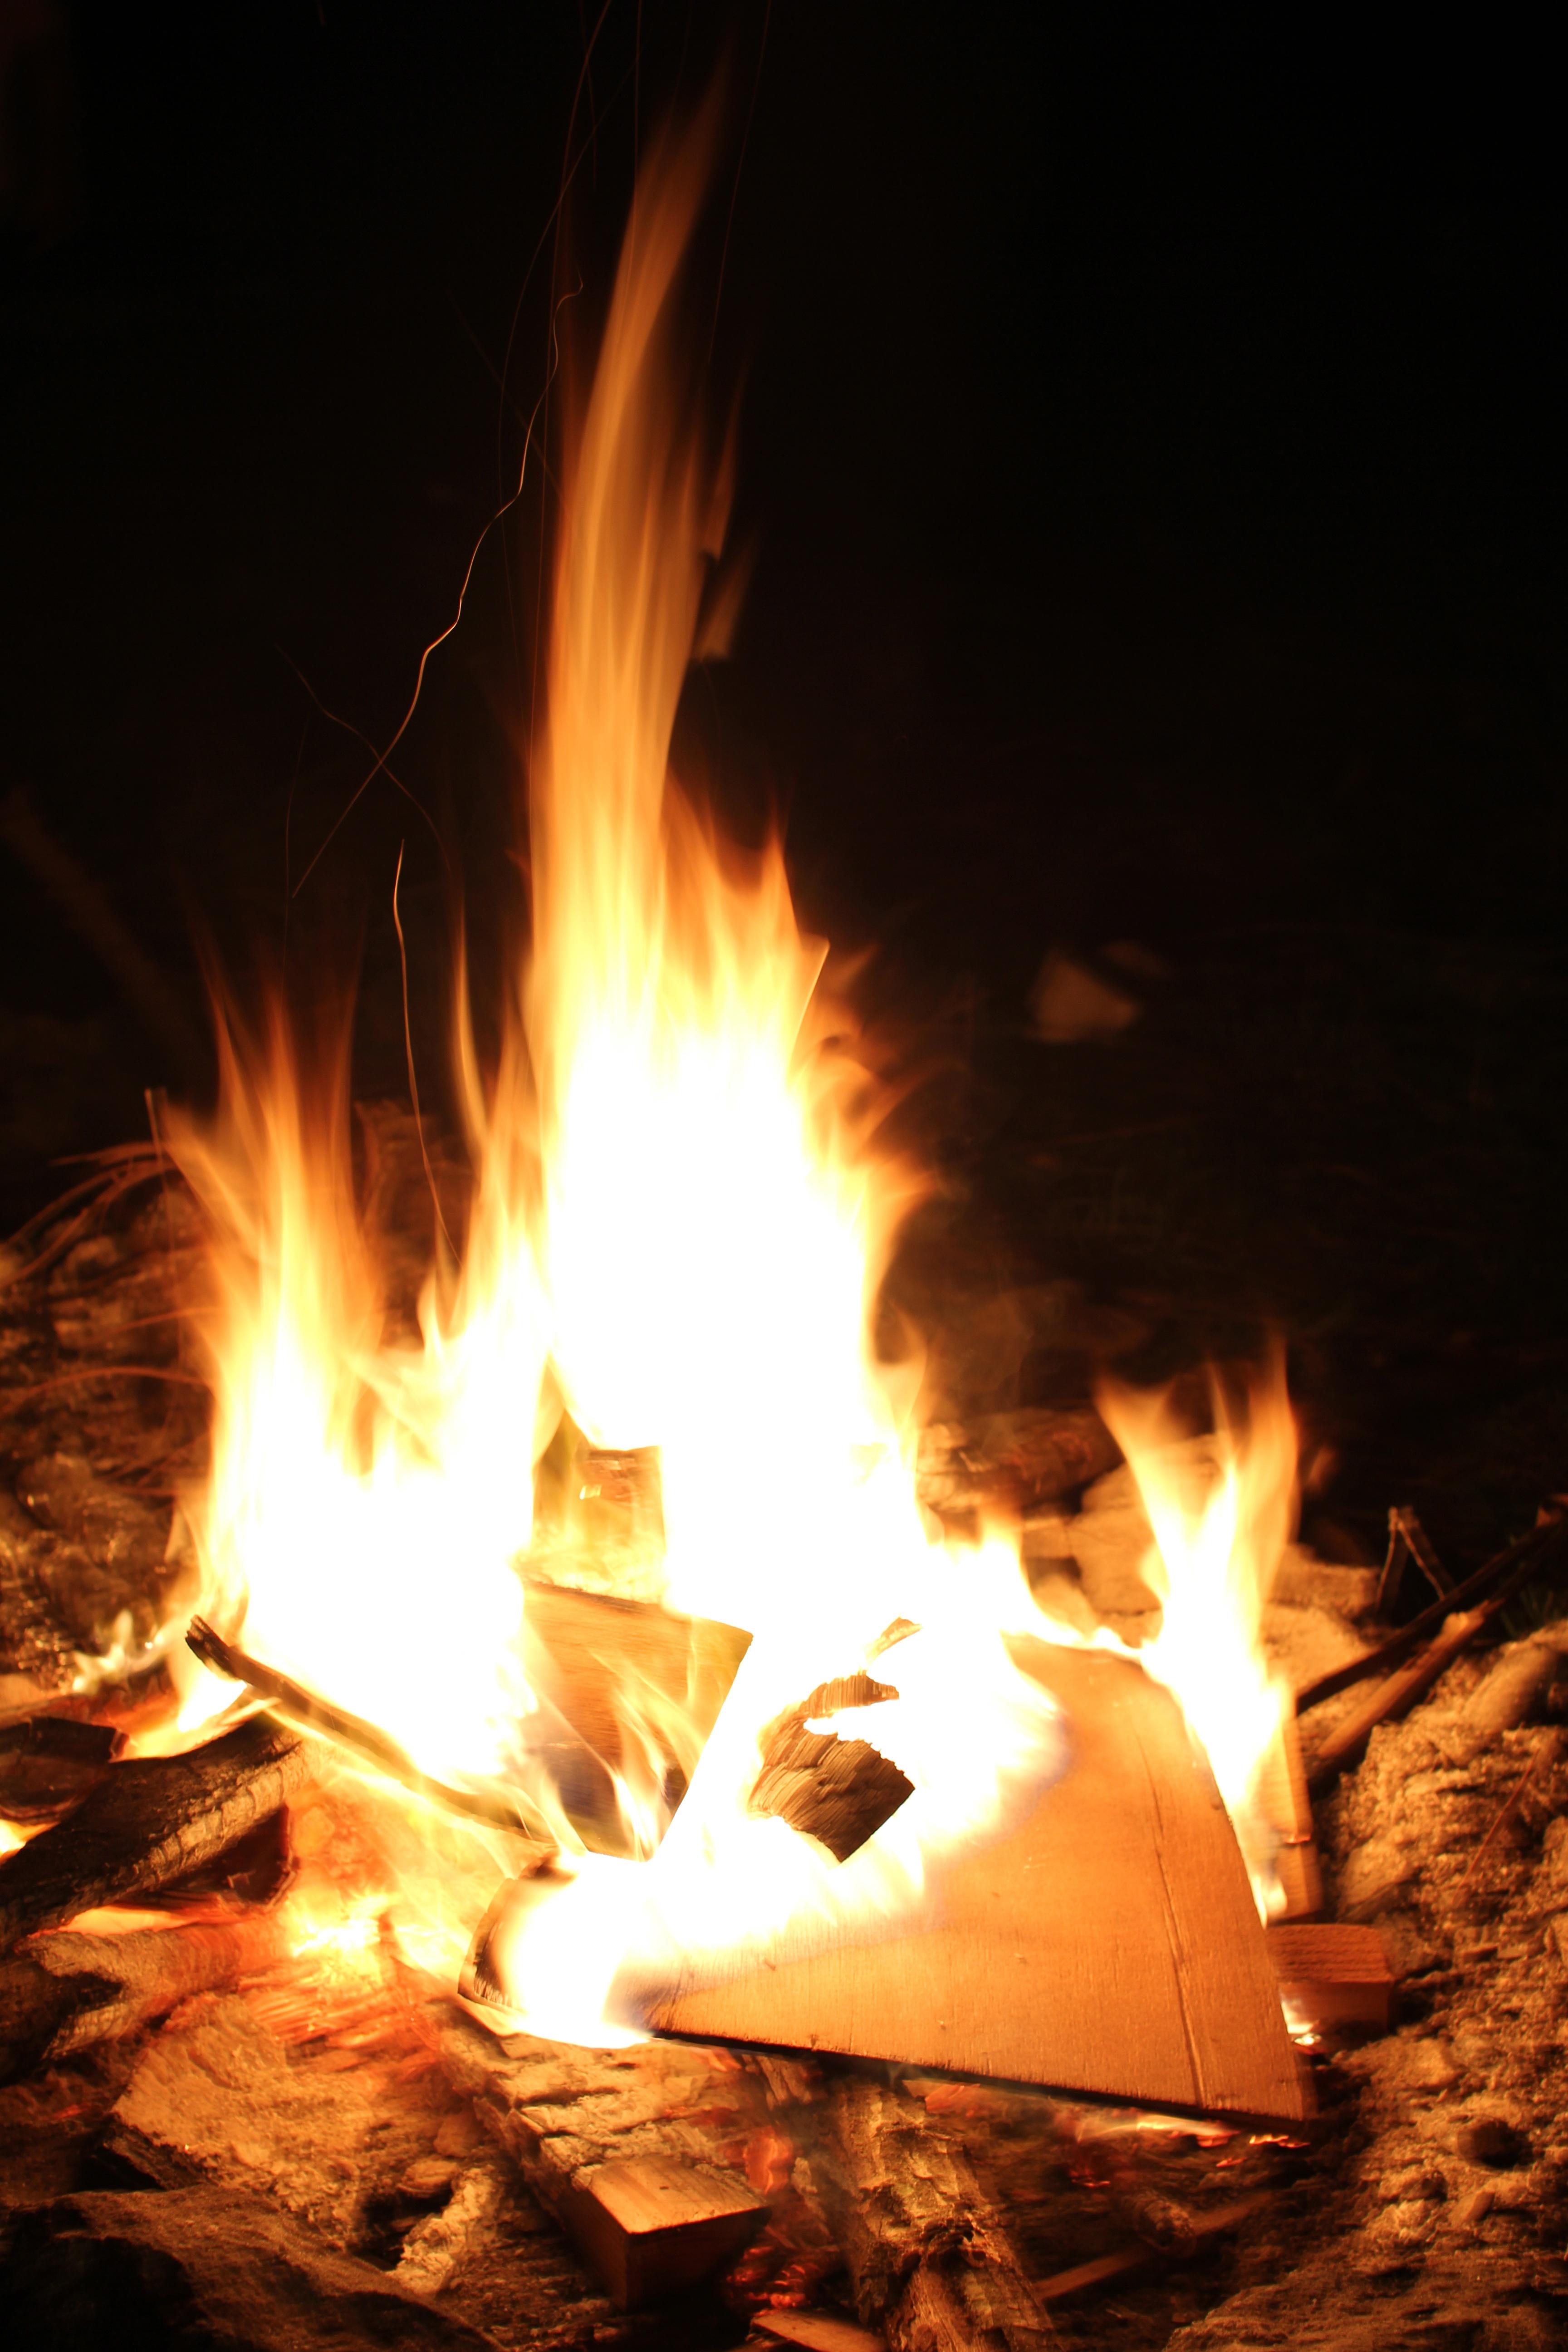 Fire, Dispose, Hot, Nature, Warm, HQ Photo